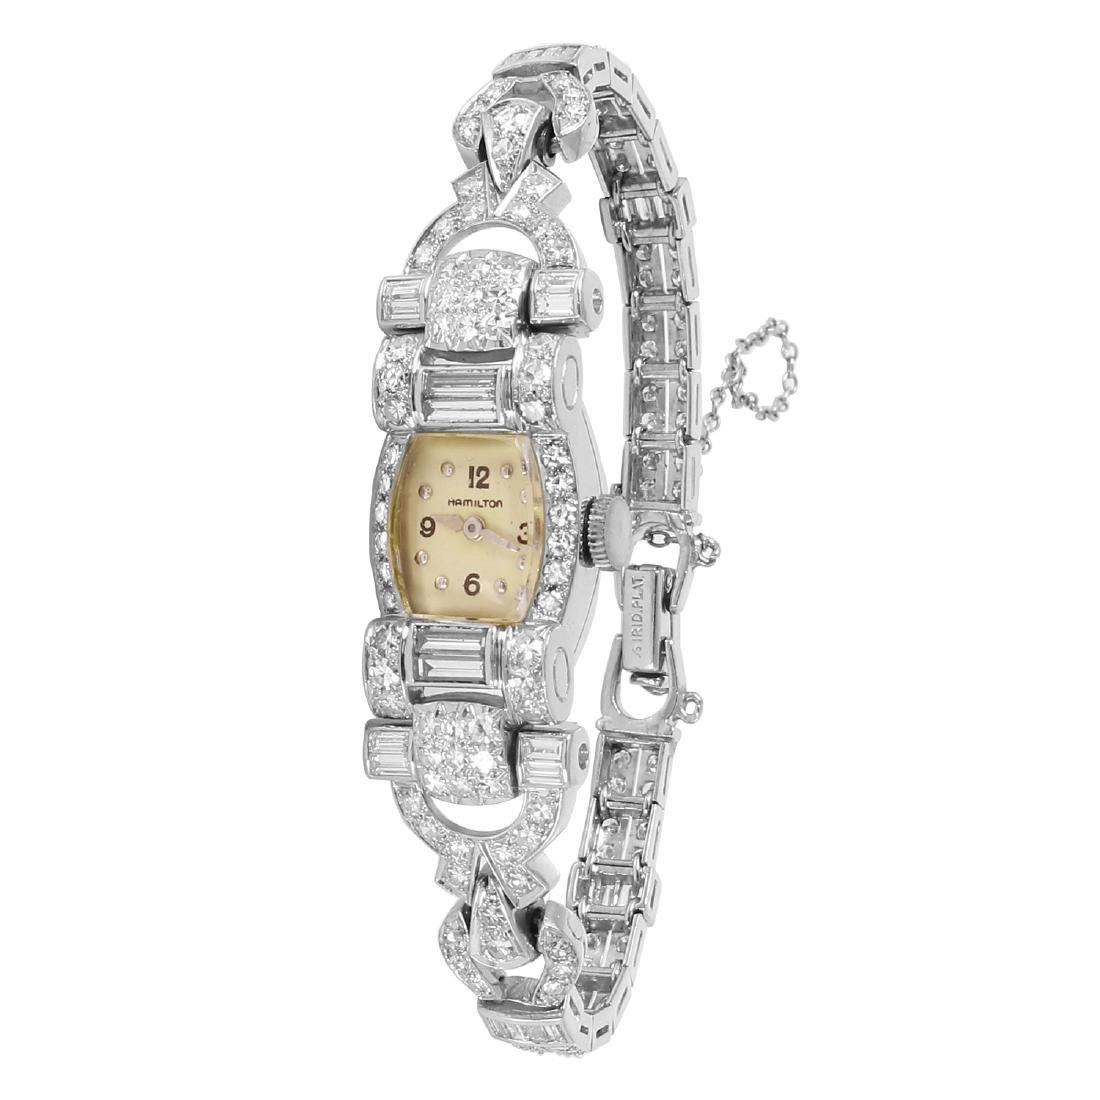 Hamilton Platinum Diamond Ladies Watch, 1930s